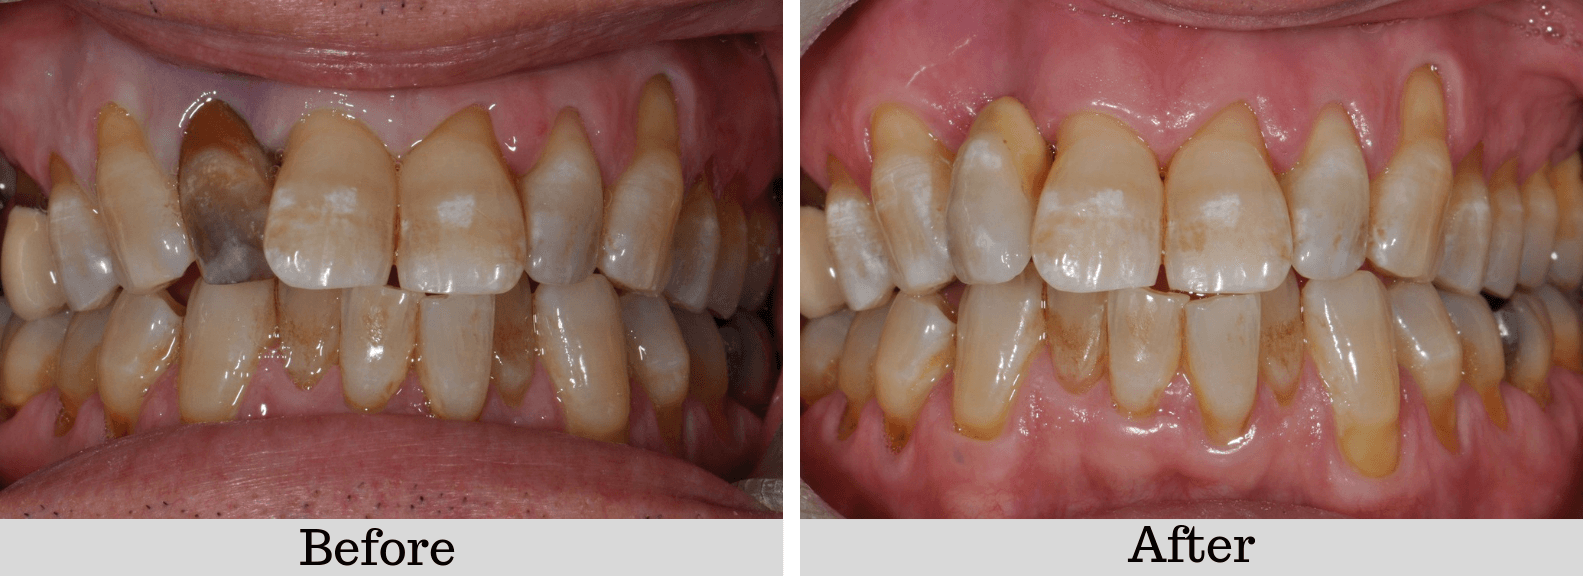 Adhesive Dental bridge